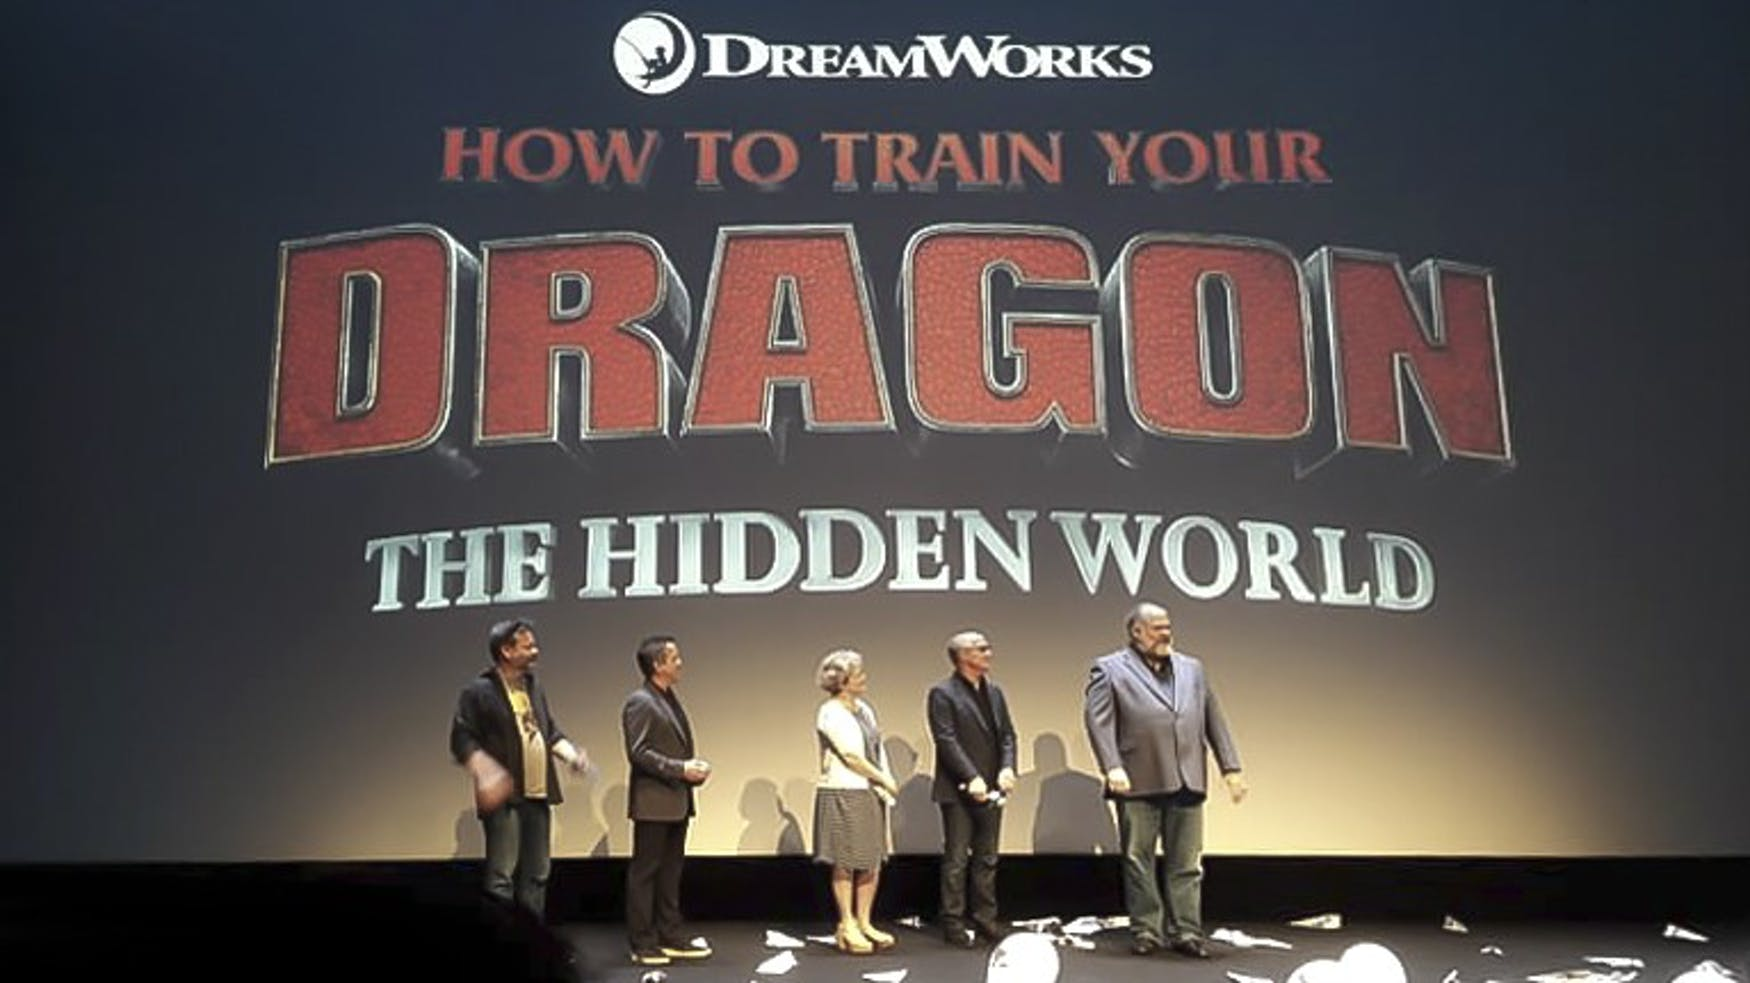 how-to-train-you-dragon-creative-common